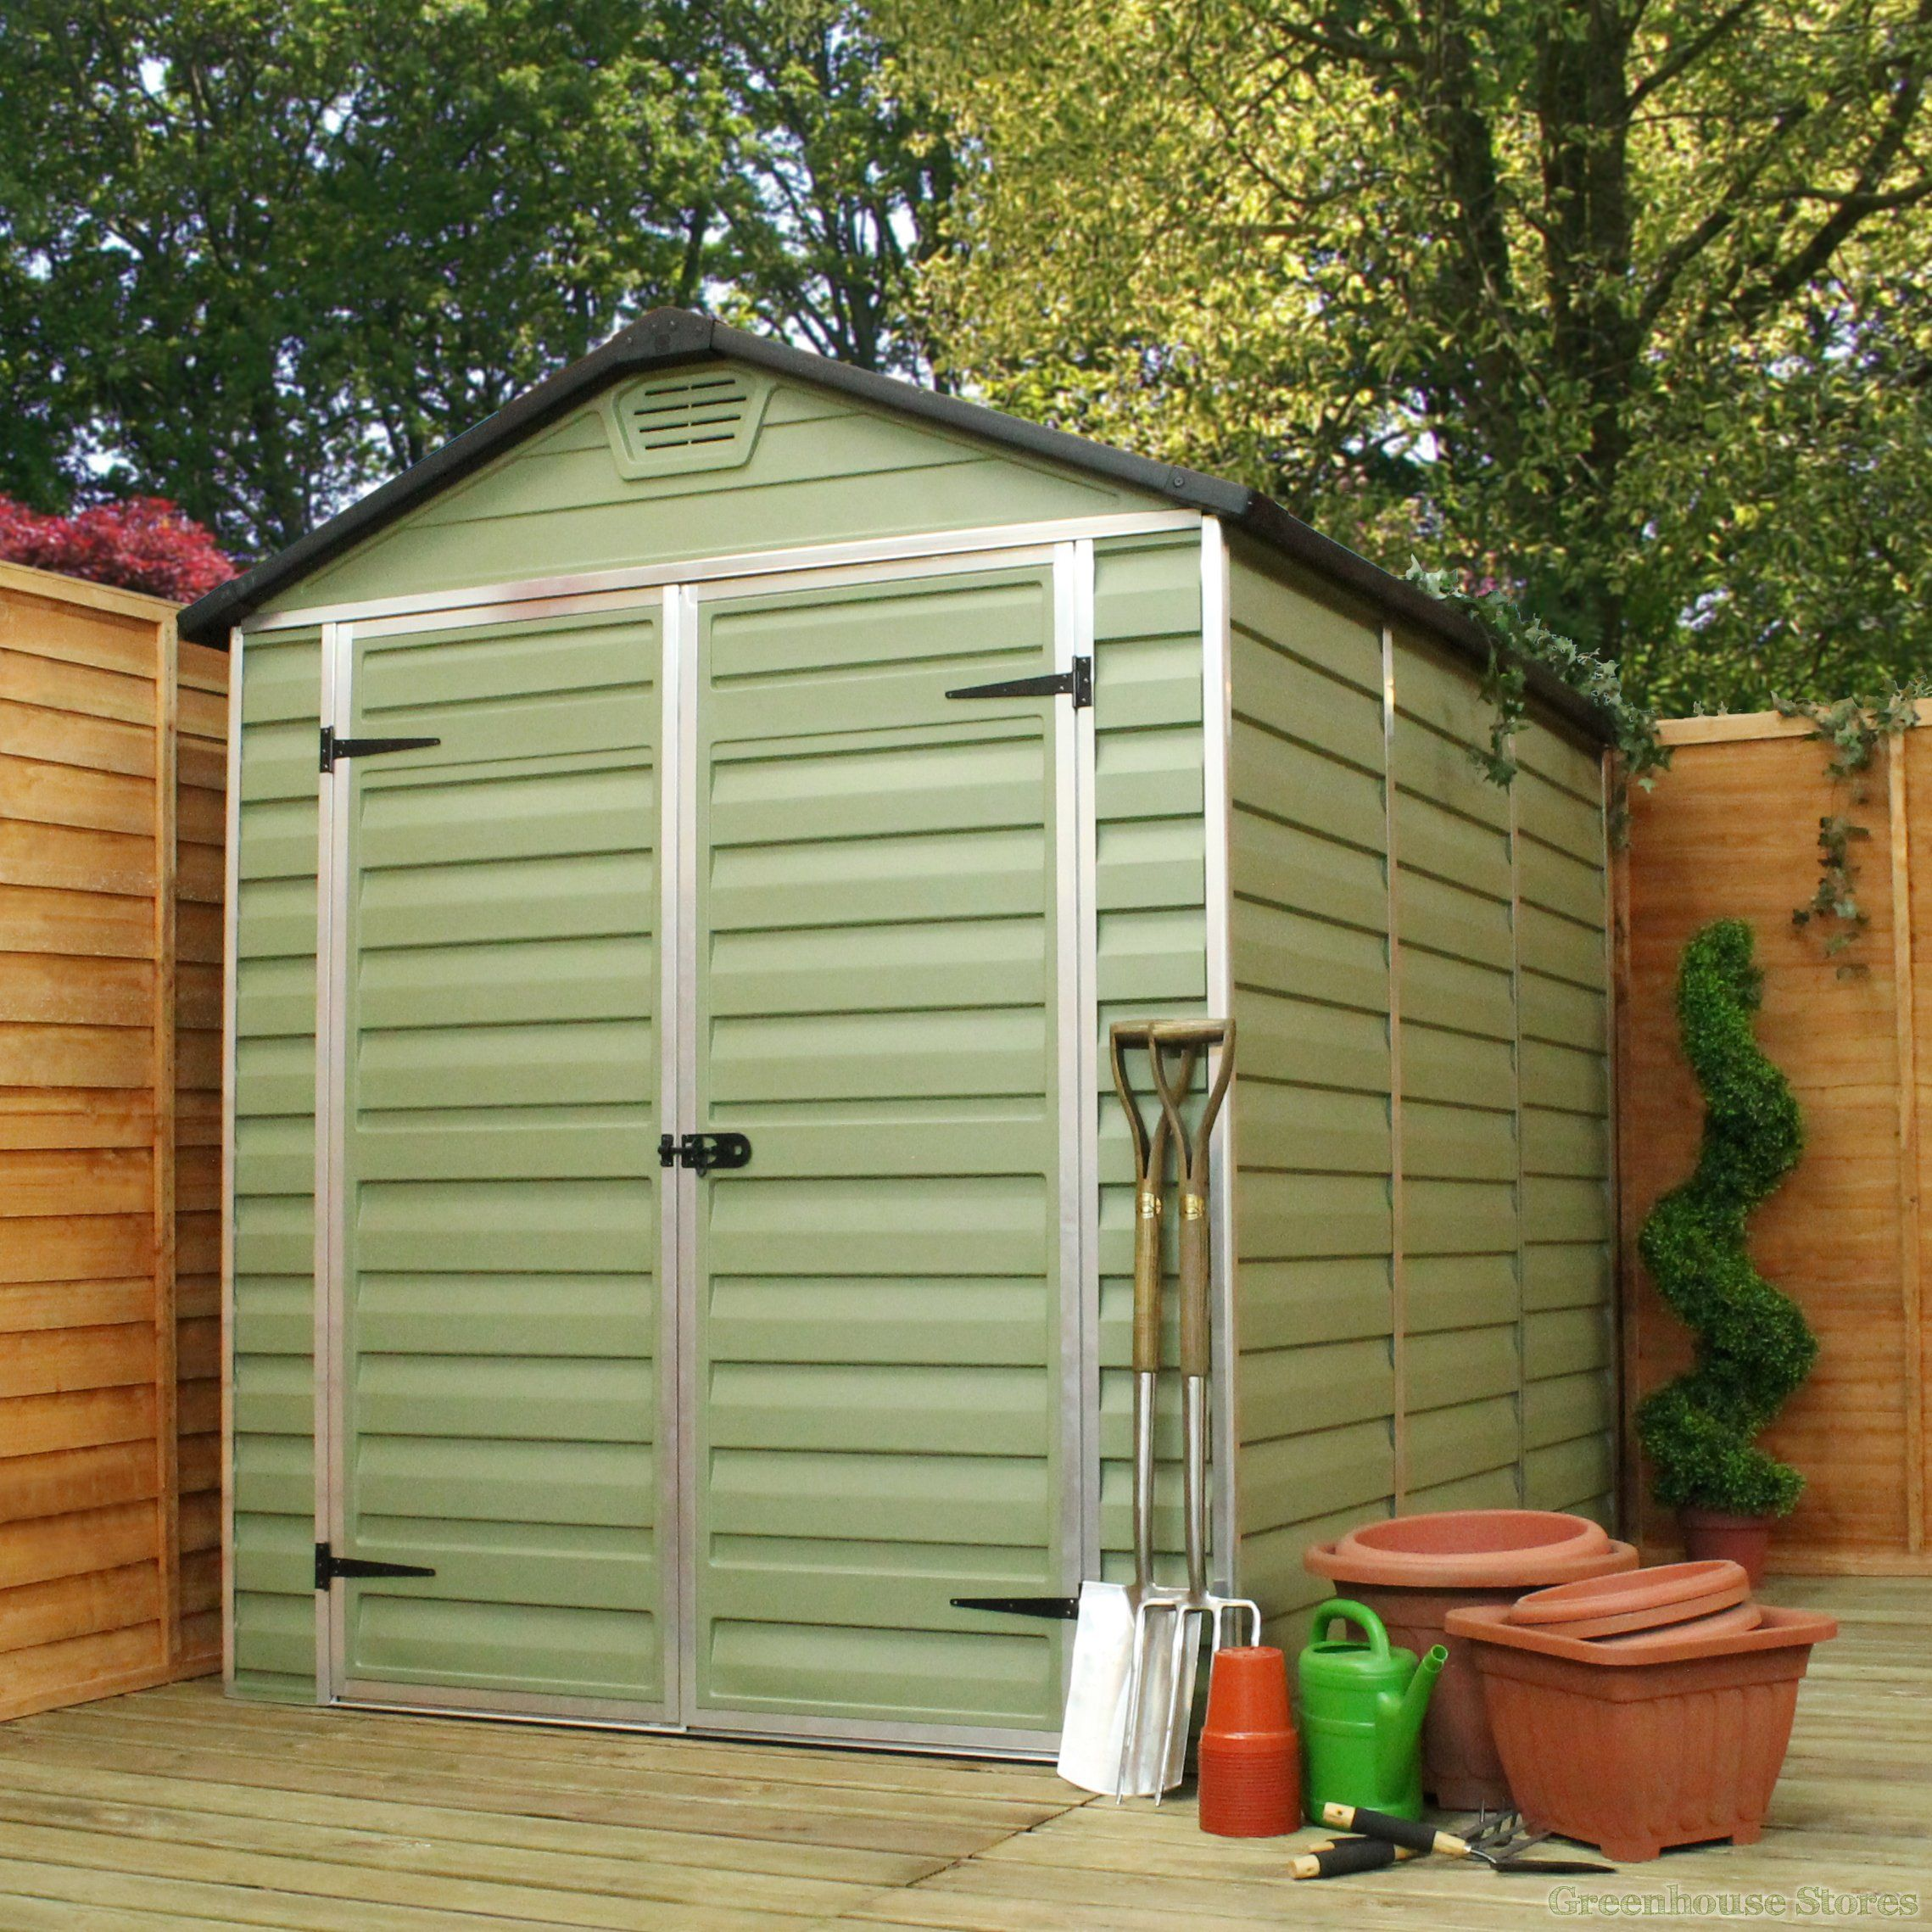 palram 6 x 5 plastic skylight shed - Garden Sheds 6 X 5